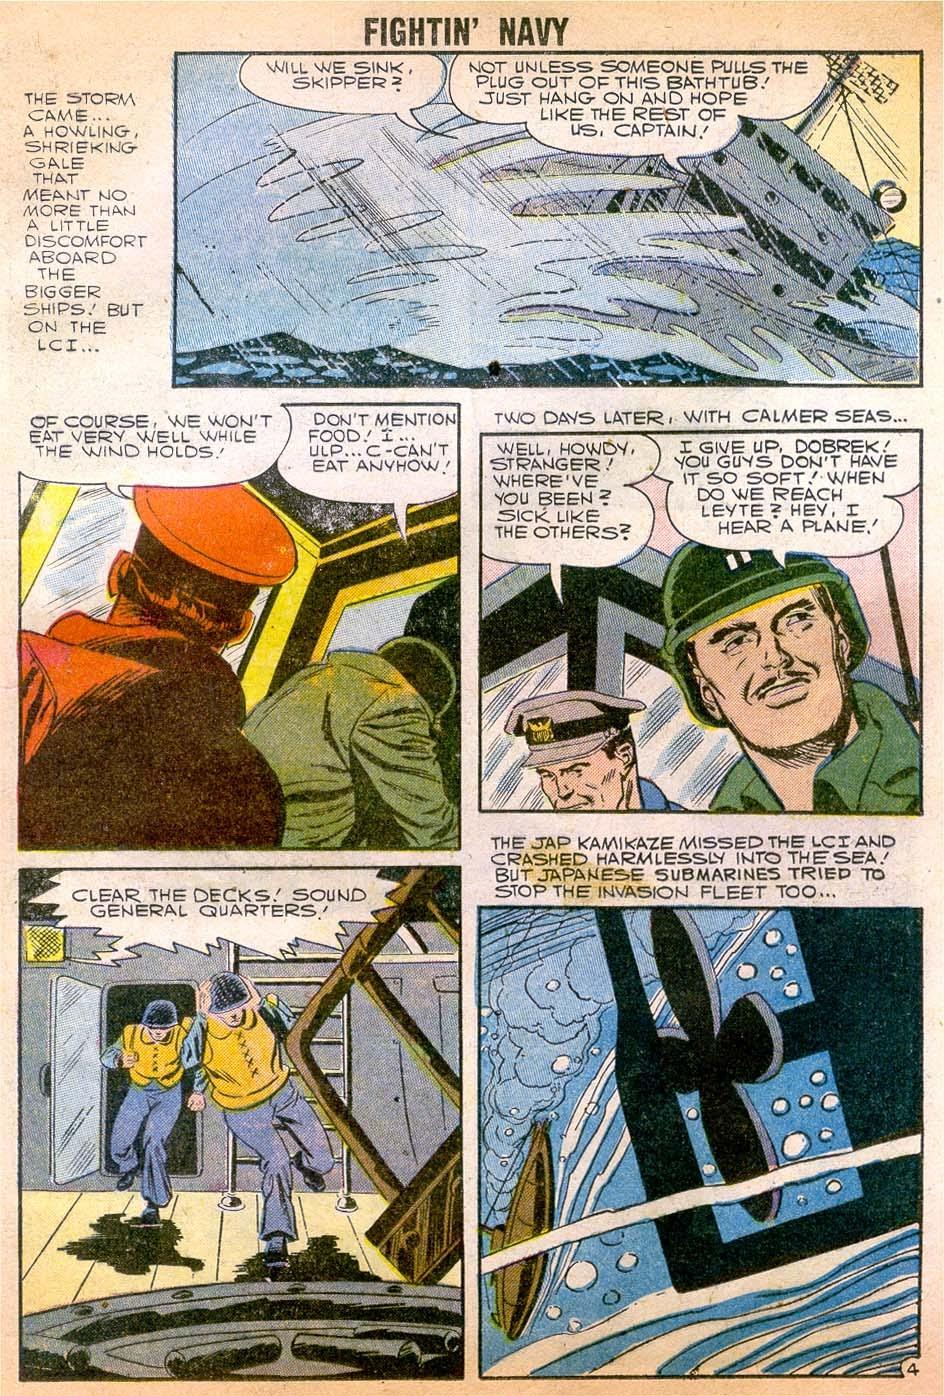 Read online Fightin' Navy comic -  Issue #79 - 25